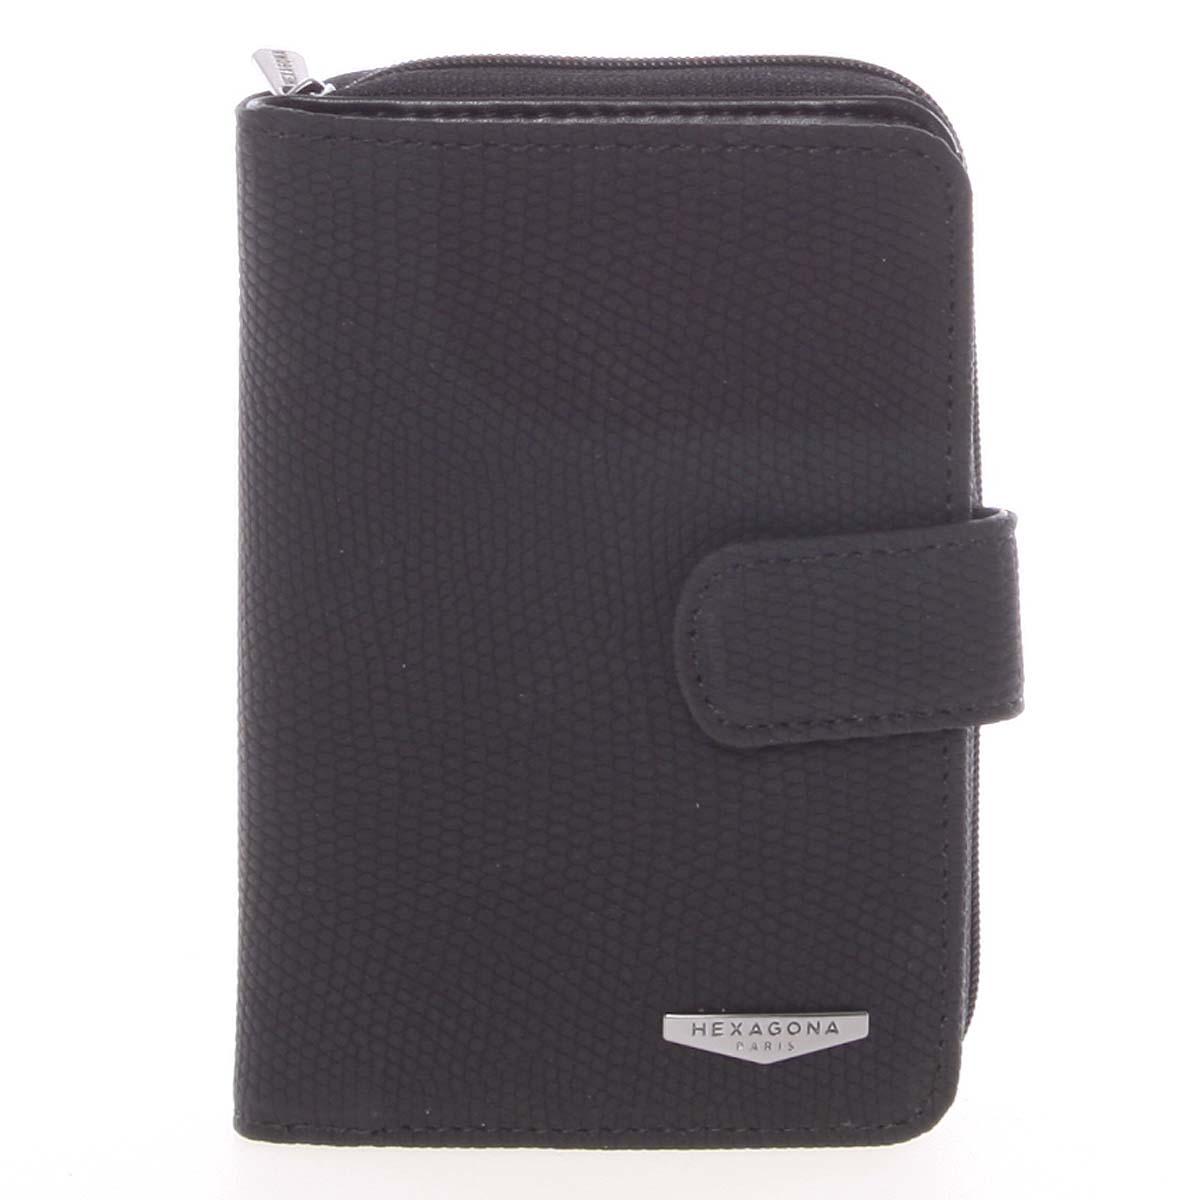 Originálna dámska dvojdielna čierna peňaženka - HEXAGONA Reezzi